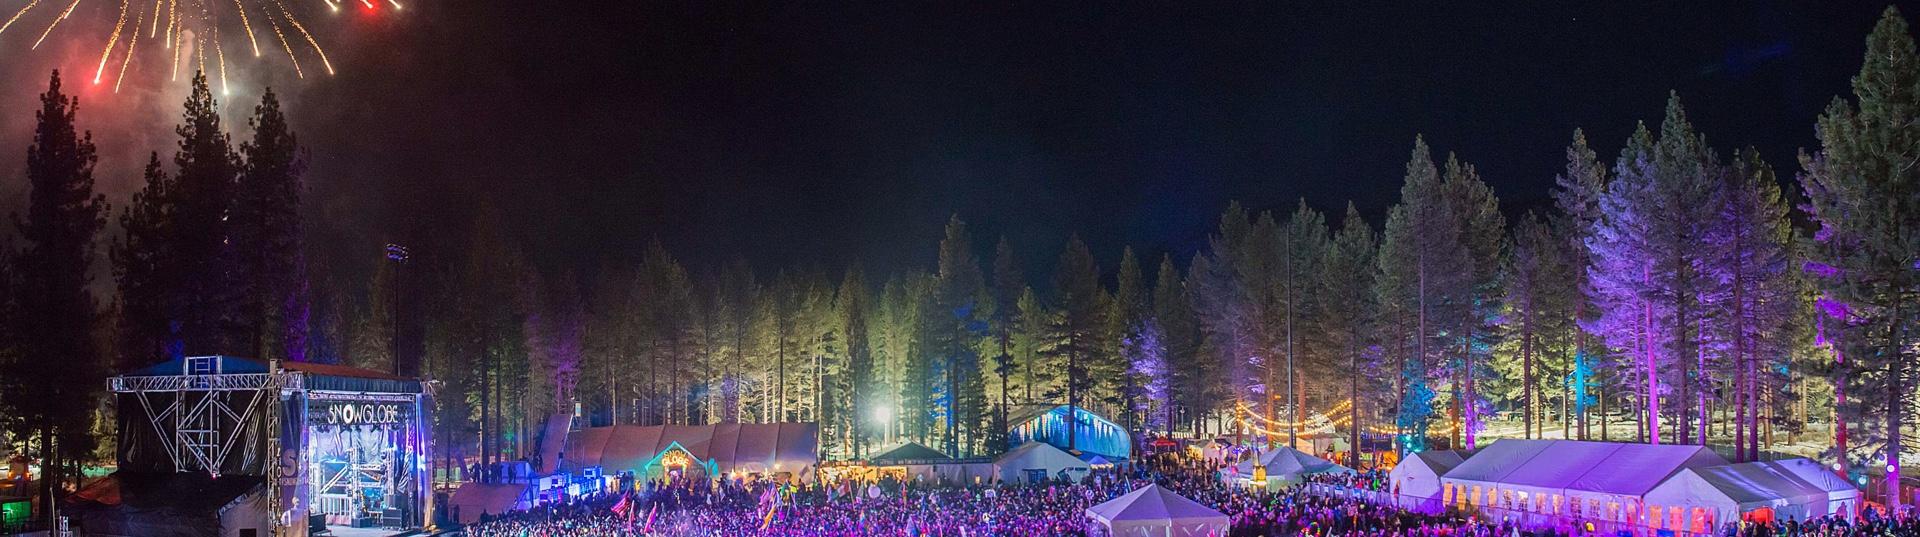 SnowGlobe Music Festival, South Lake Tahoe, CA